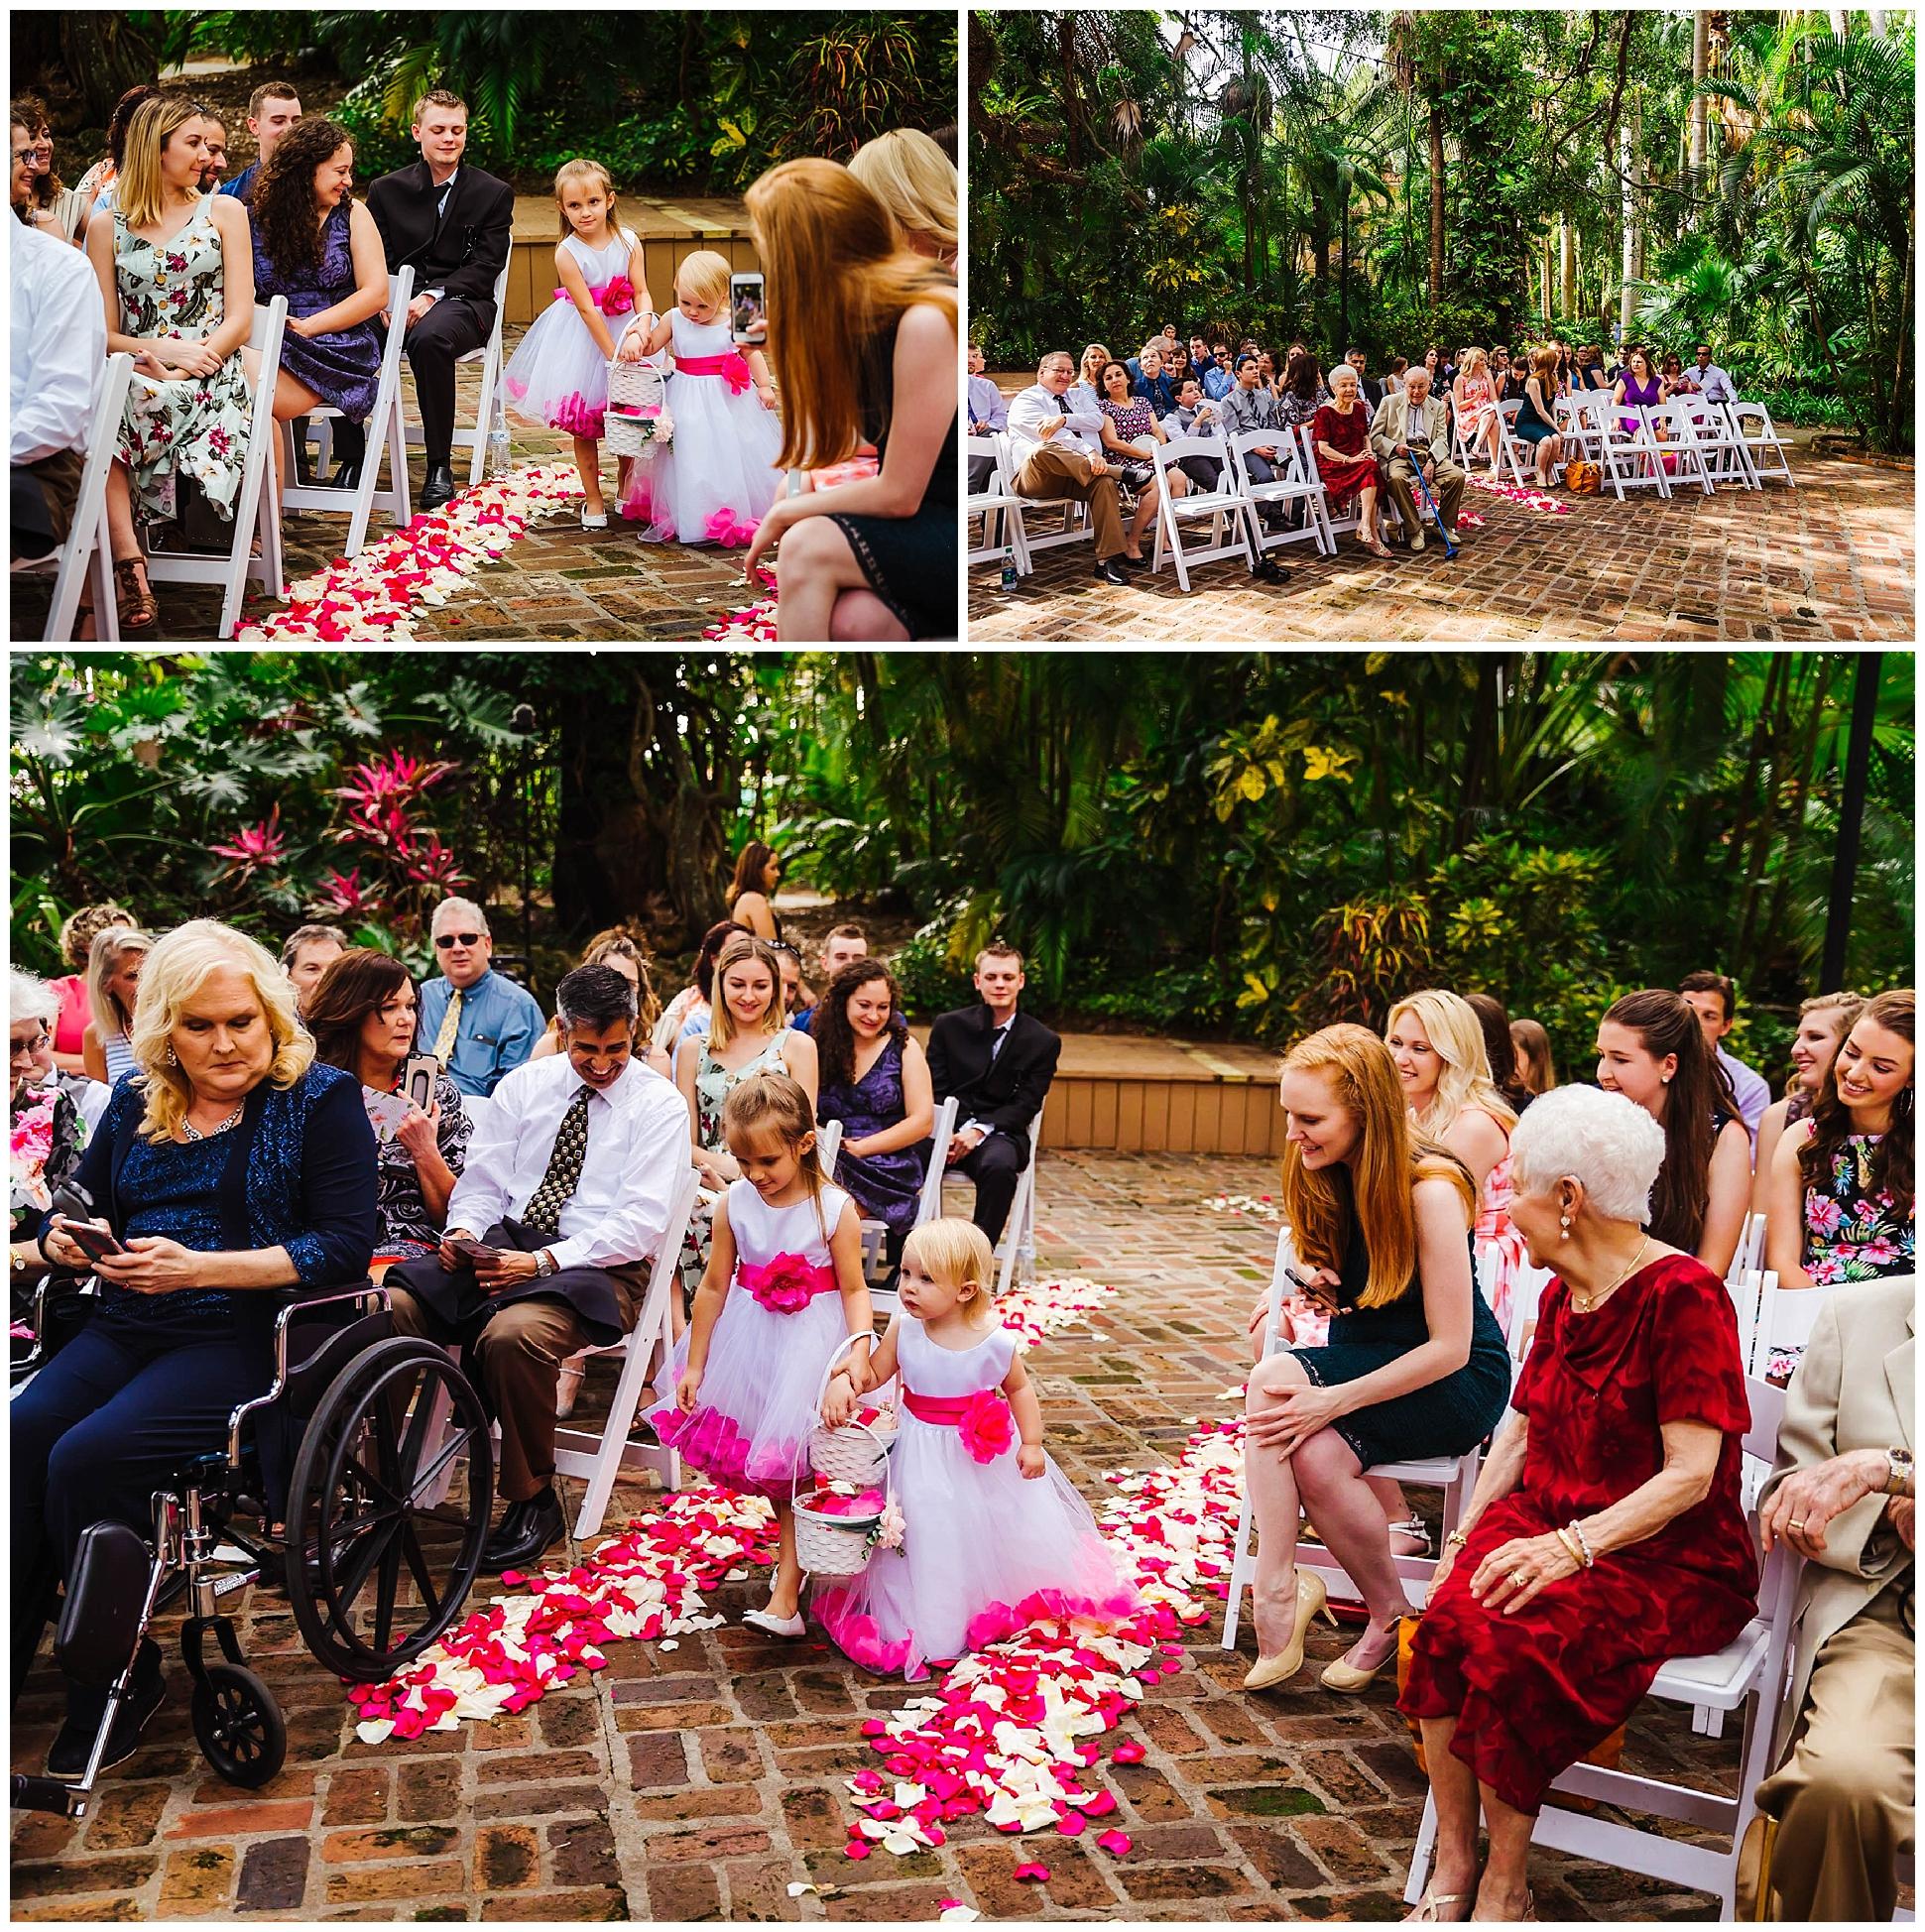 st-pete-wedding-photographer-sunken-gardens-crystal-ballroom-princess-dancer_0146.jpg